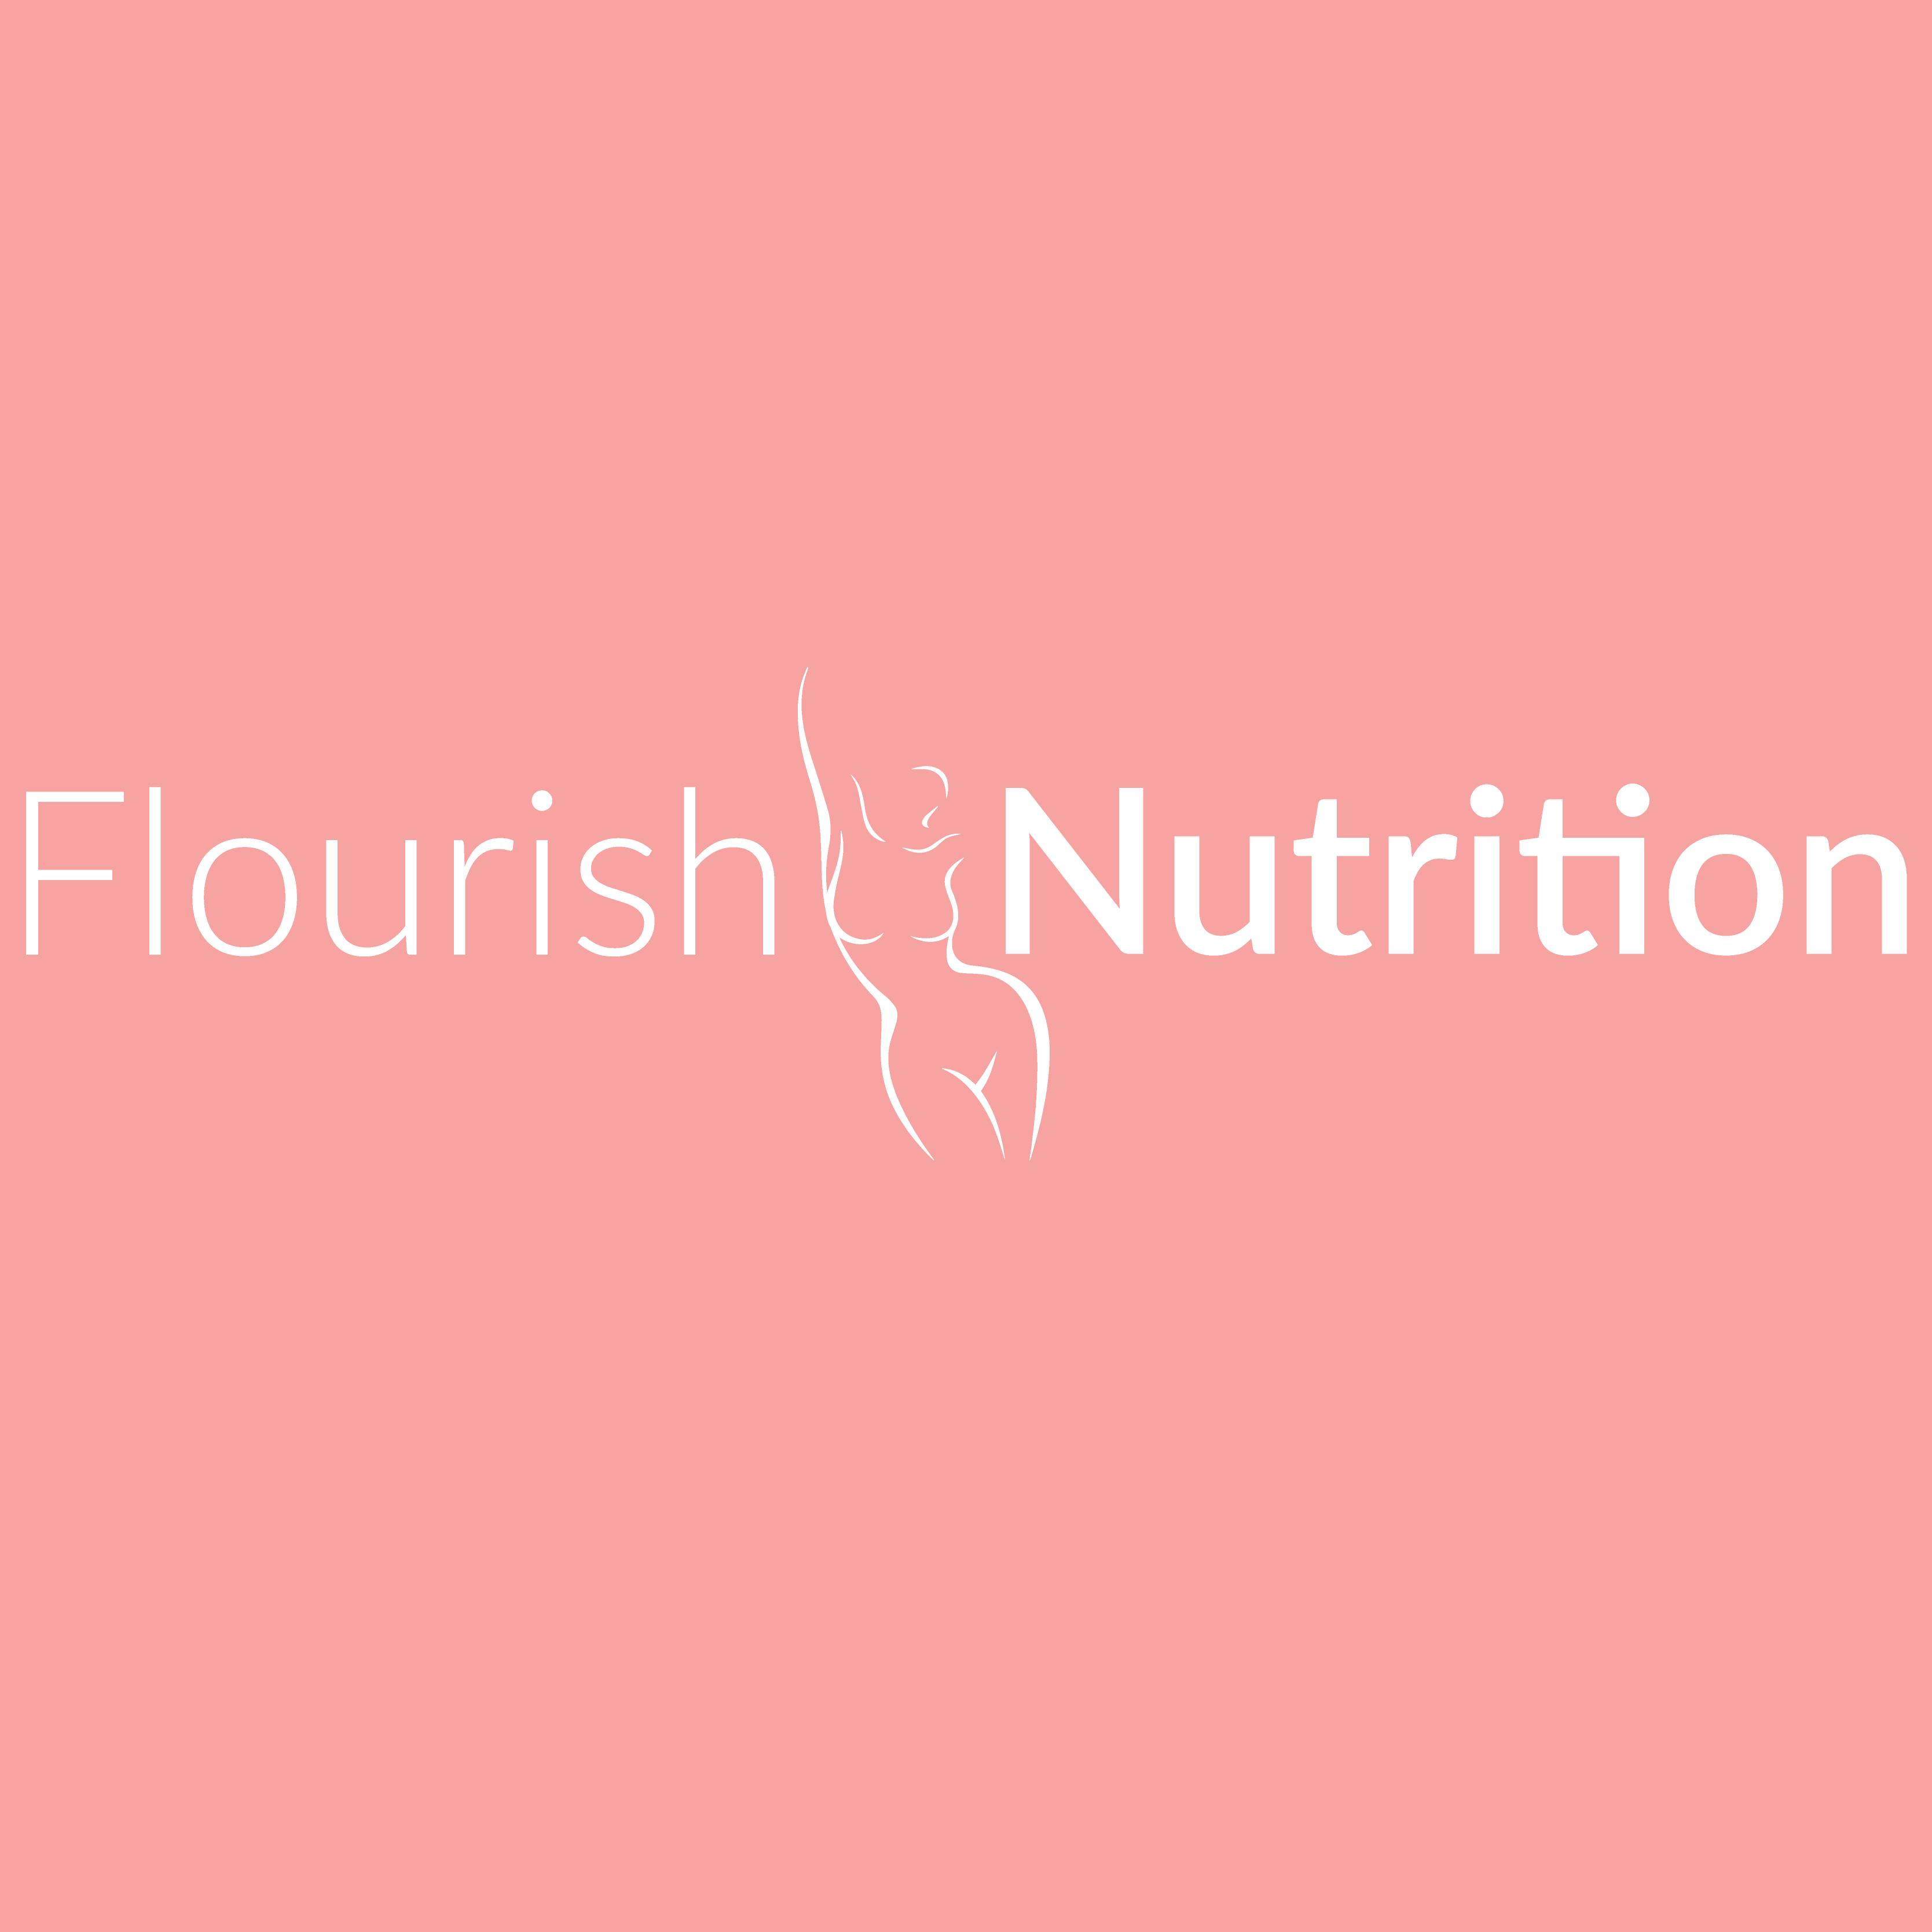 Flourish Nutrition internships in Central London, London